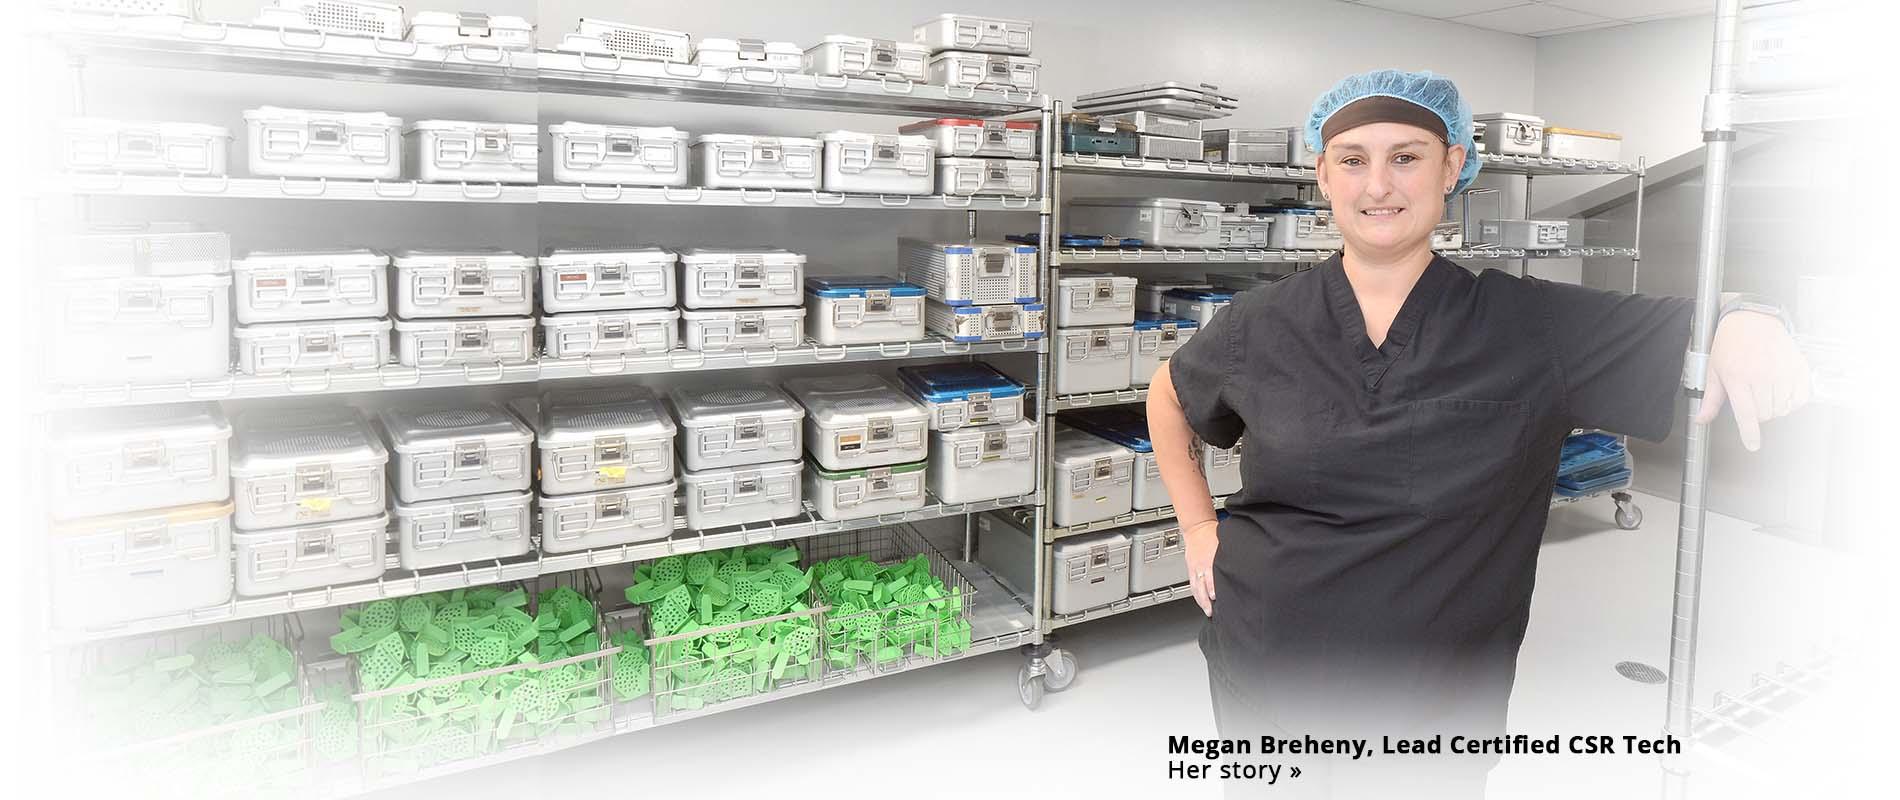 Megan Breheny  Sterile Reprocessing room